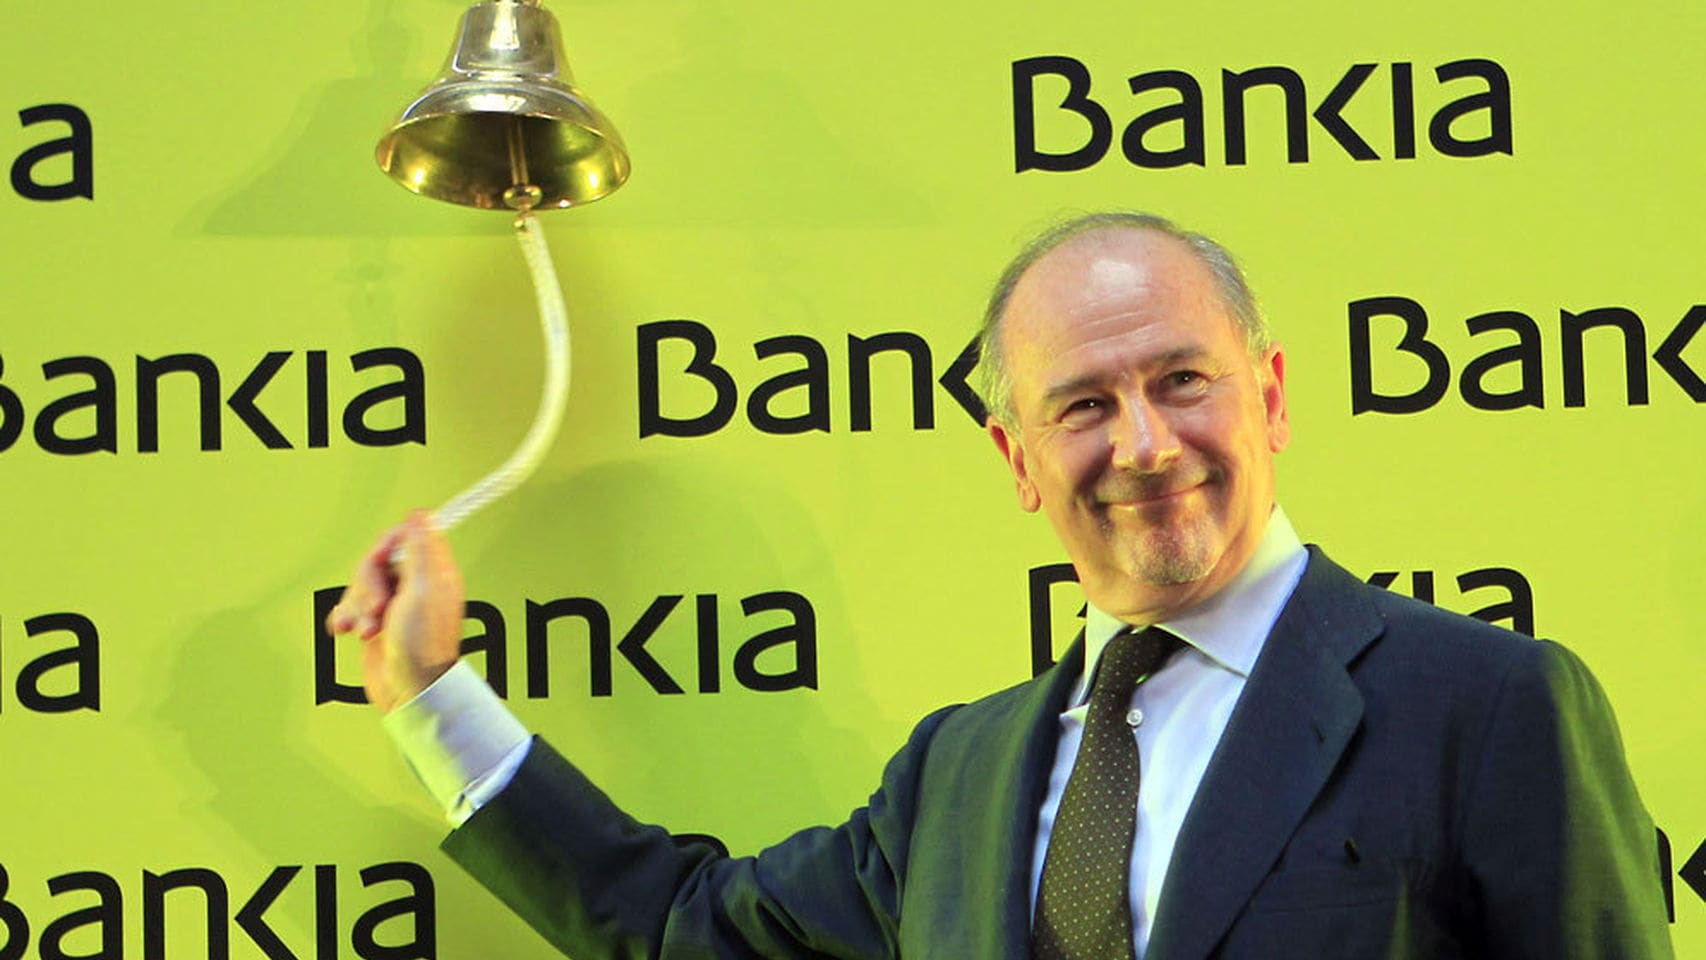 El expresidente de Bankia, Rodrigo Rato. I La Marea